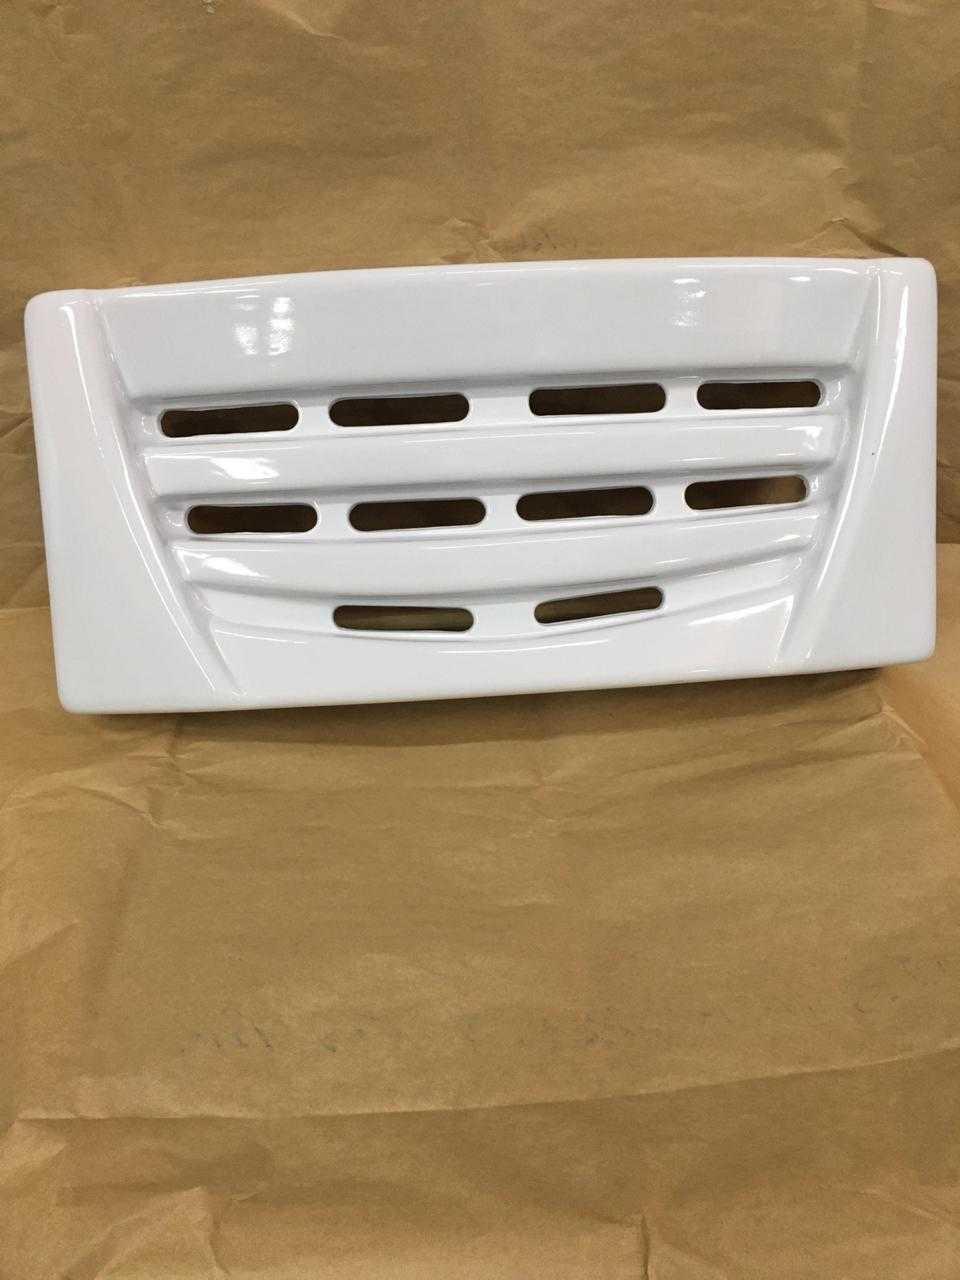 Rodapé compatível Freezer Vertical Fricon 30 x 66